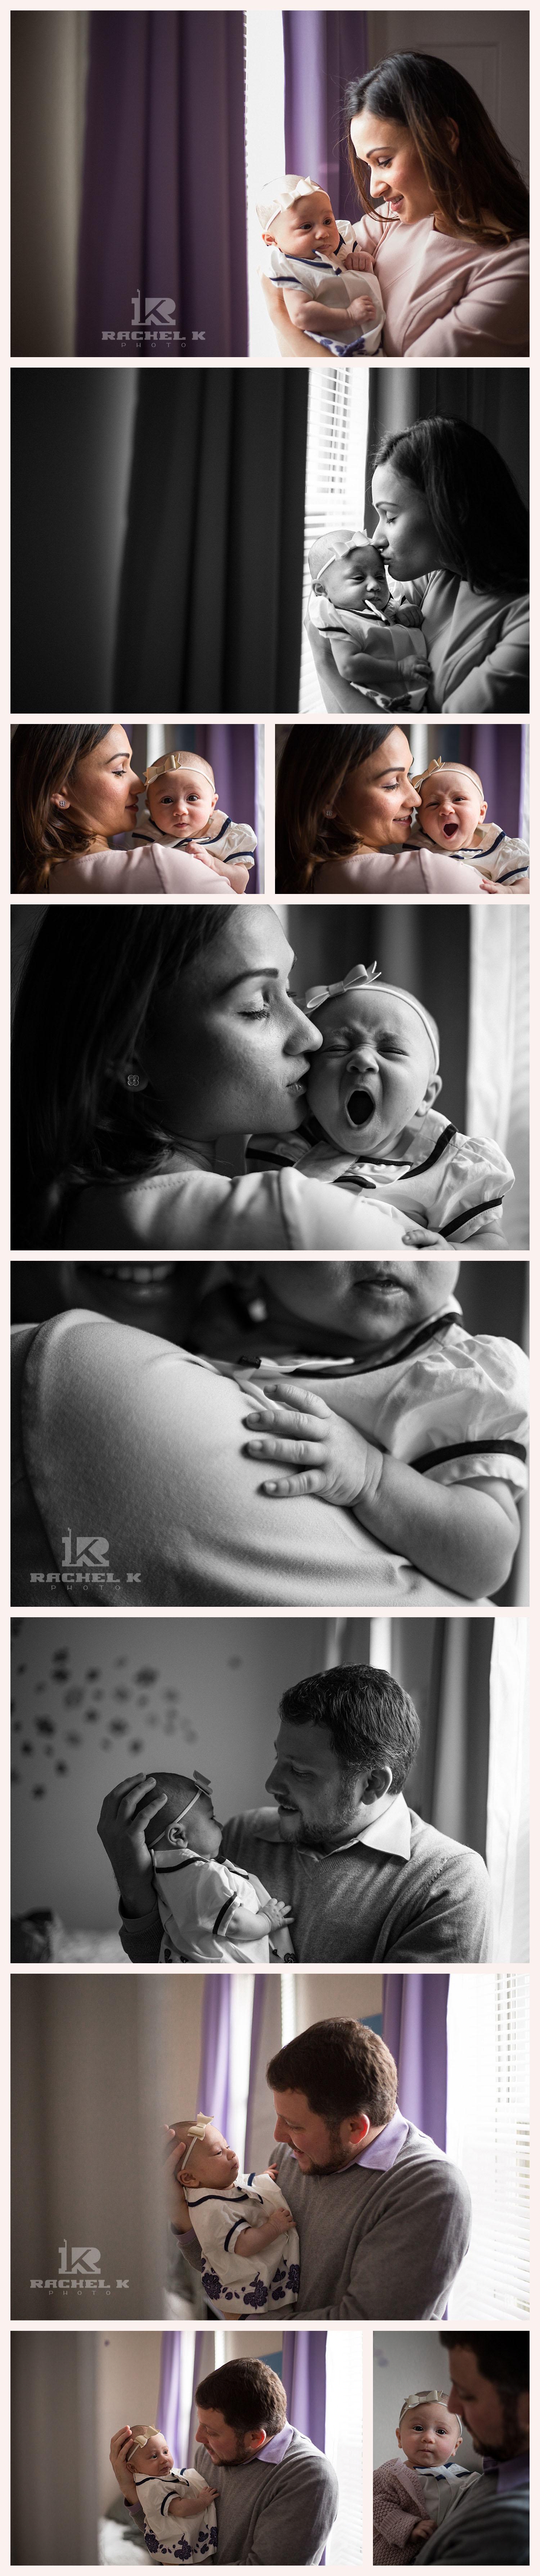 DC newborn session by Rachel K Photo